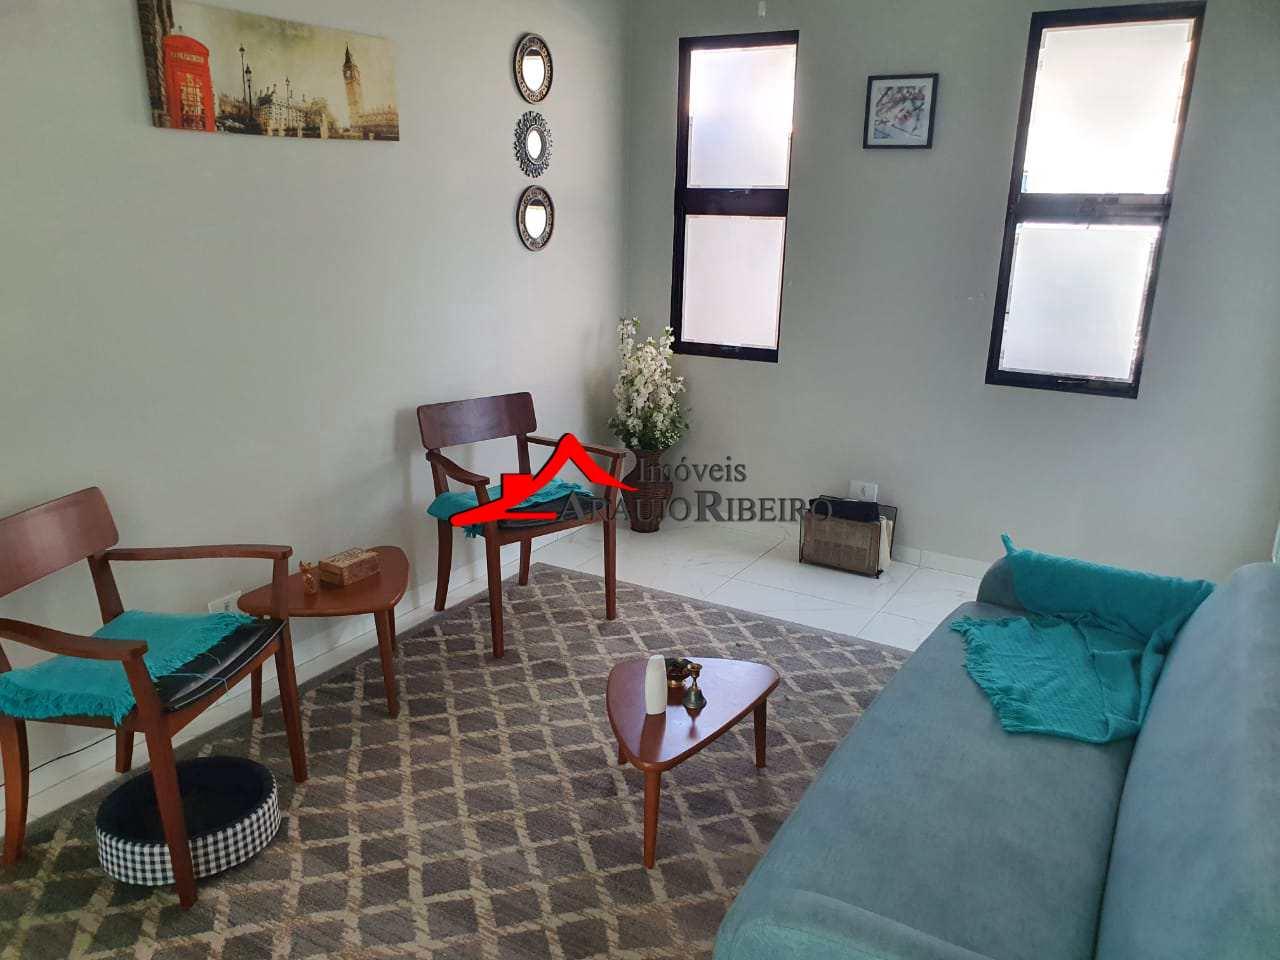 Casa com 3 dorms, Tremembé - R$ 450 mil Cod: 60606